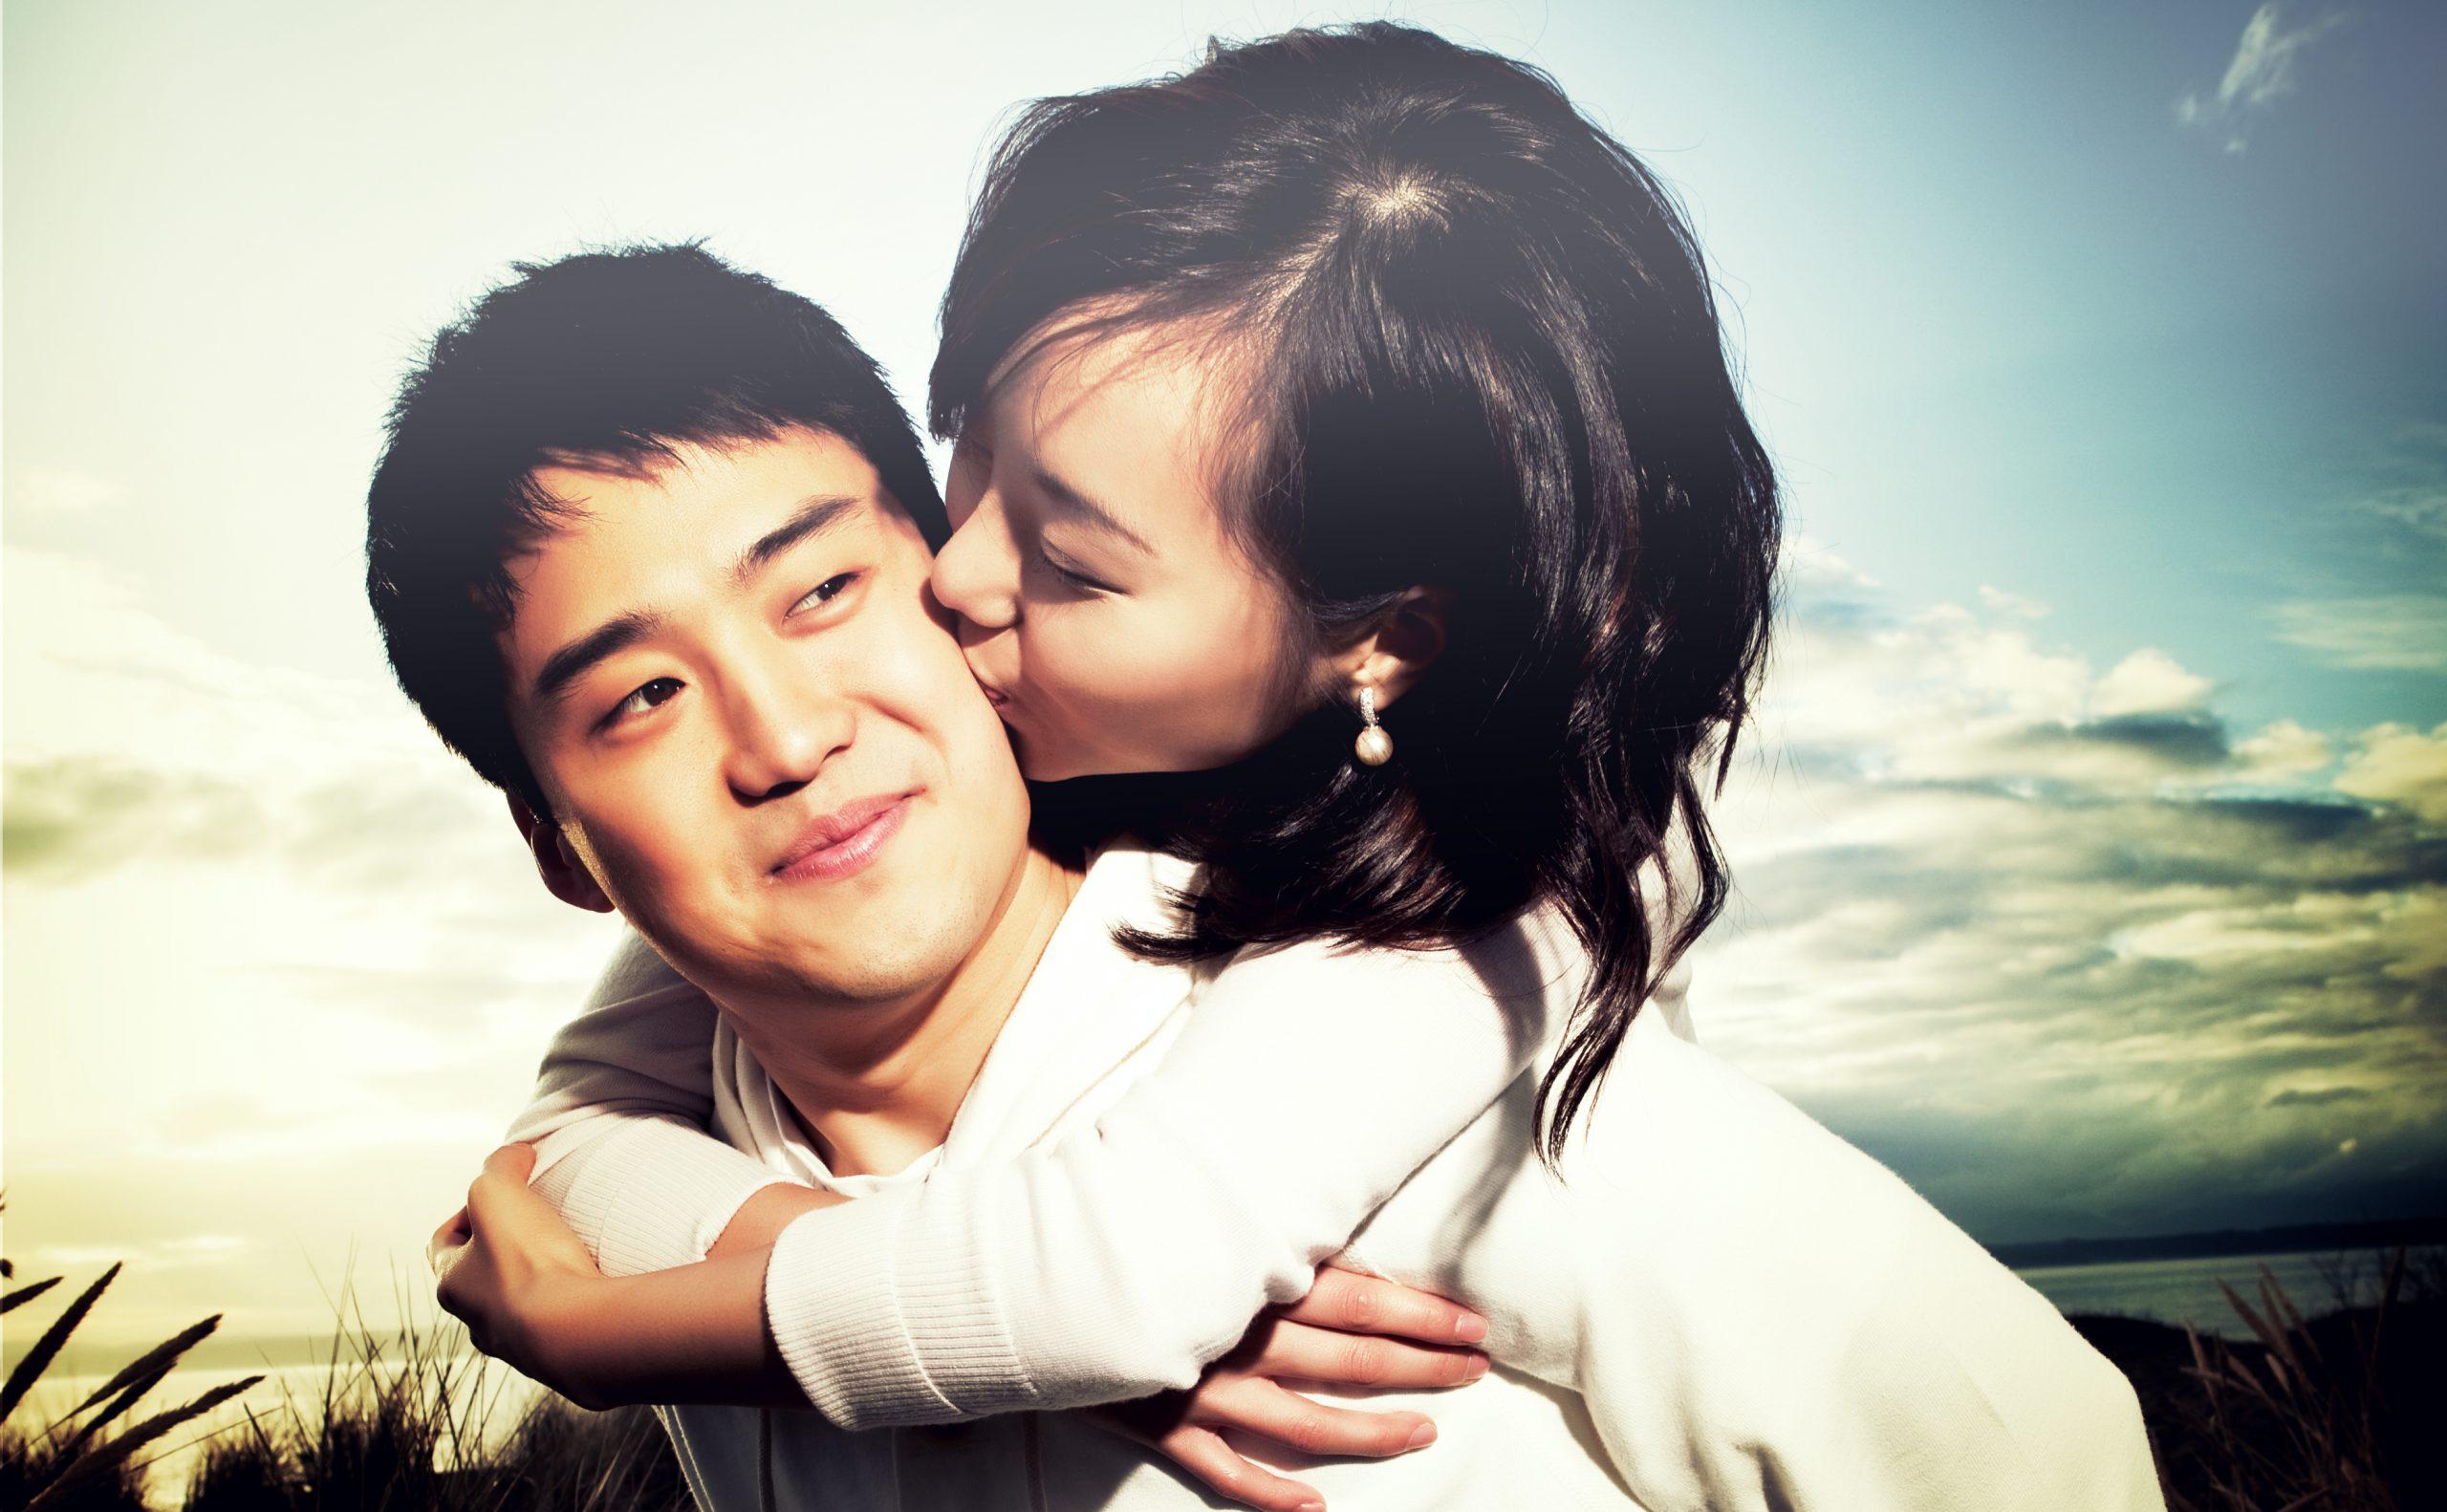 Loving your partner despite their flaws